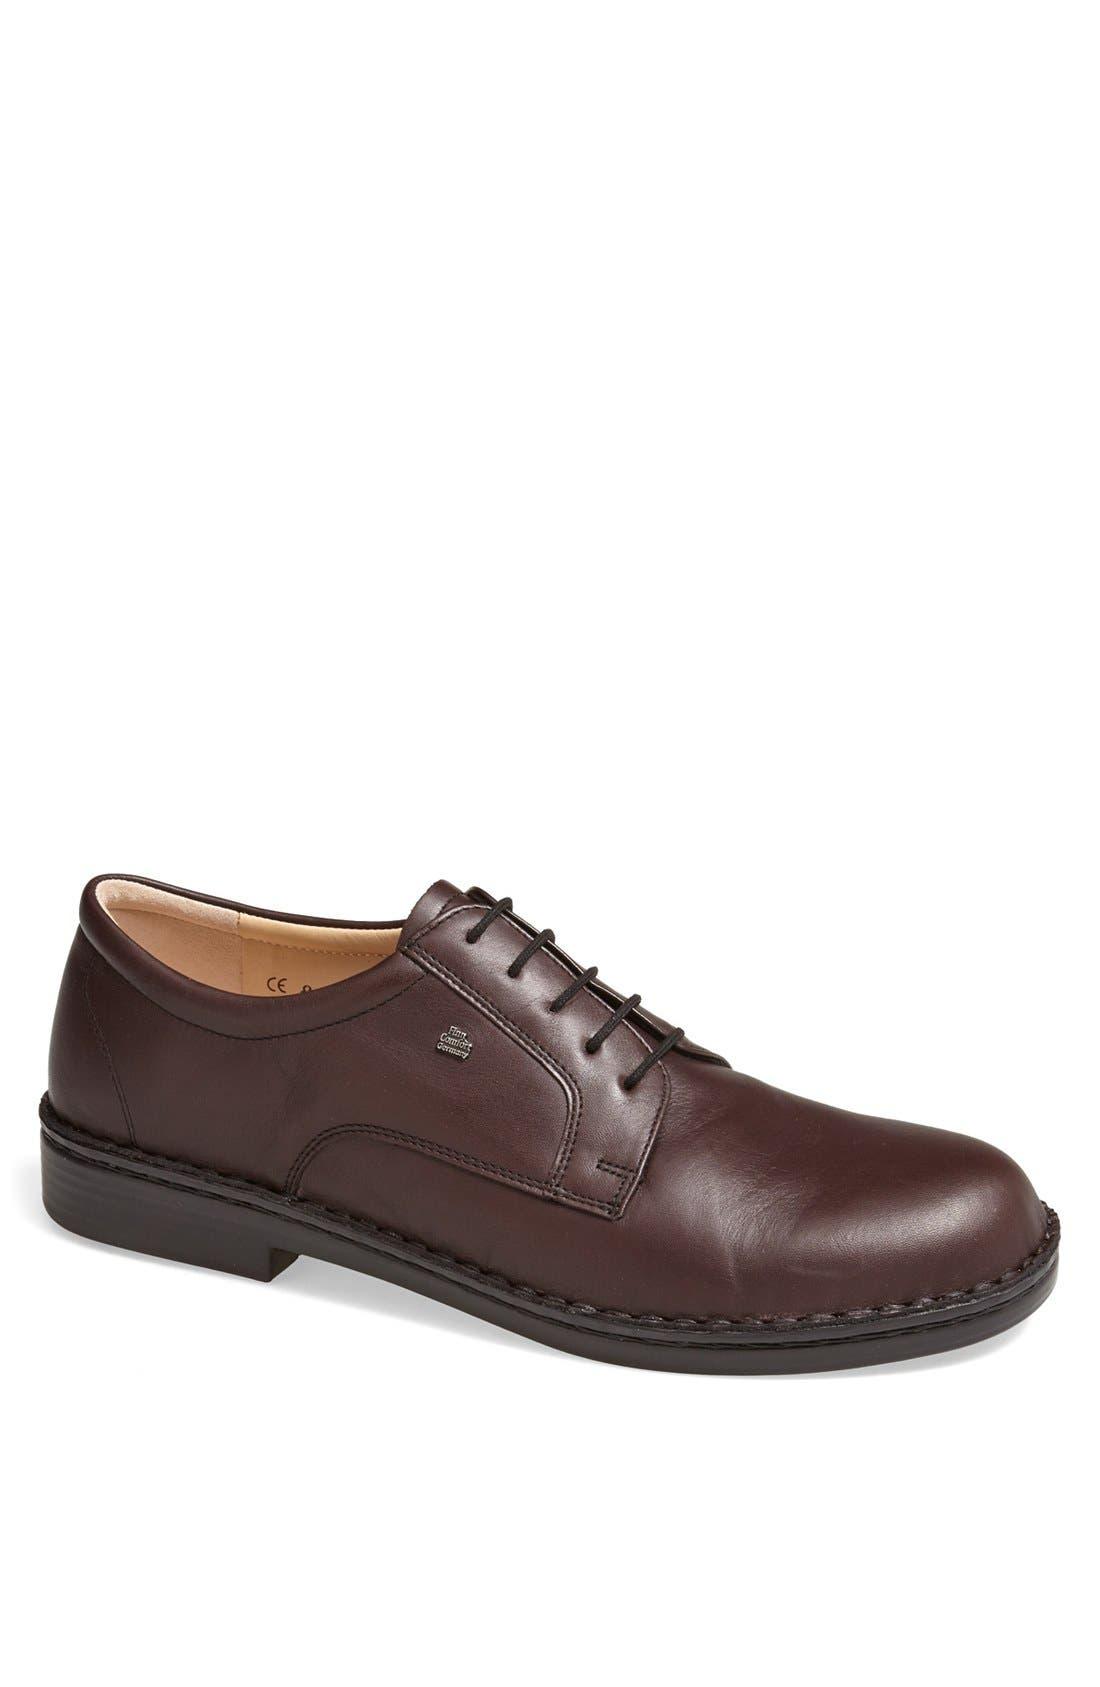 Main Image - Finn Comfort 'Milano' Plain Toe Derby (Men)